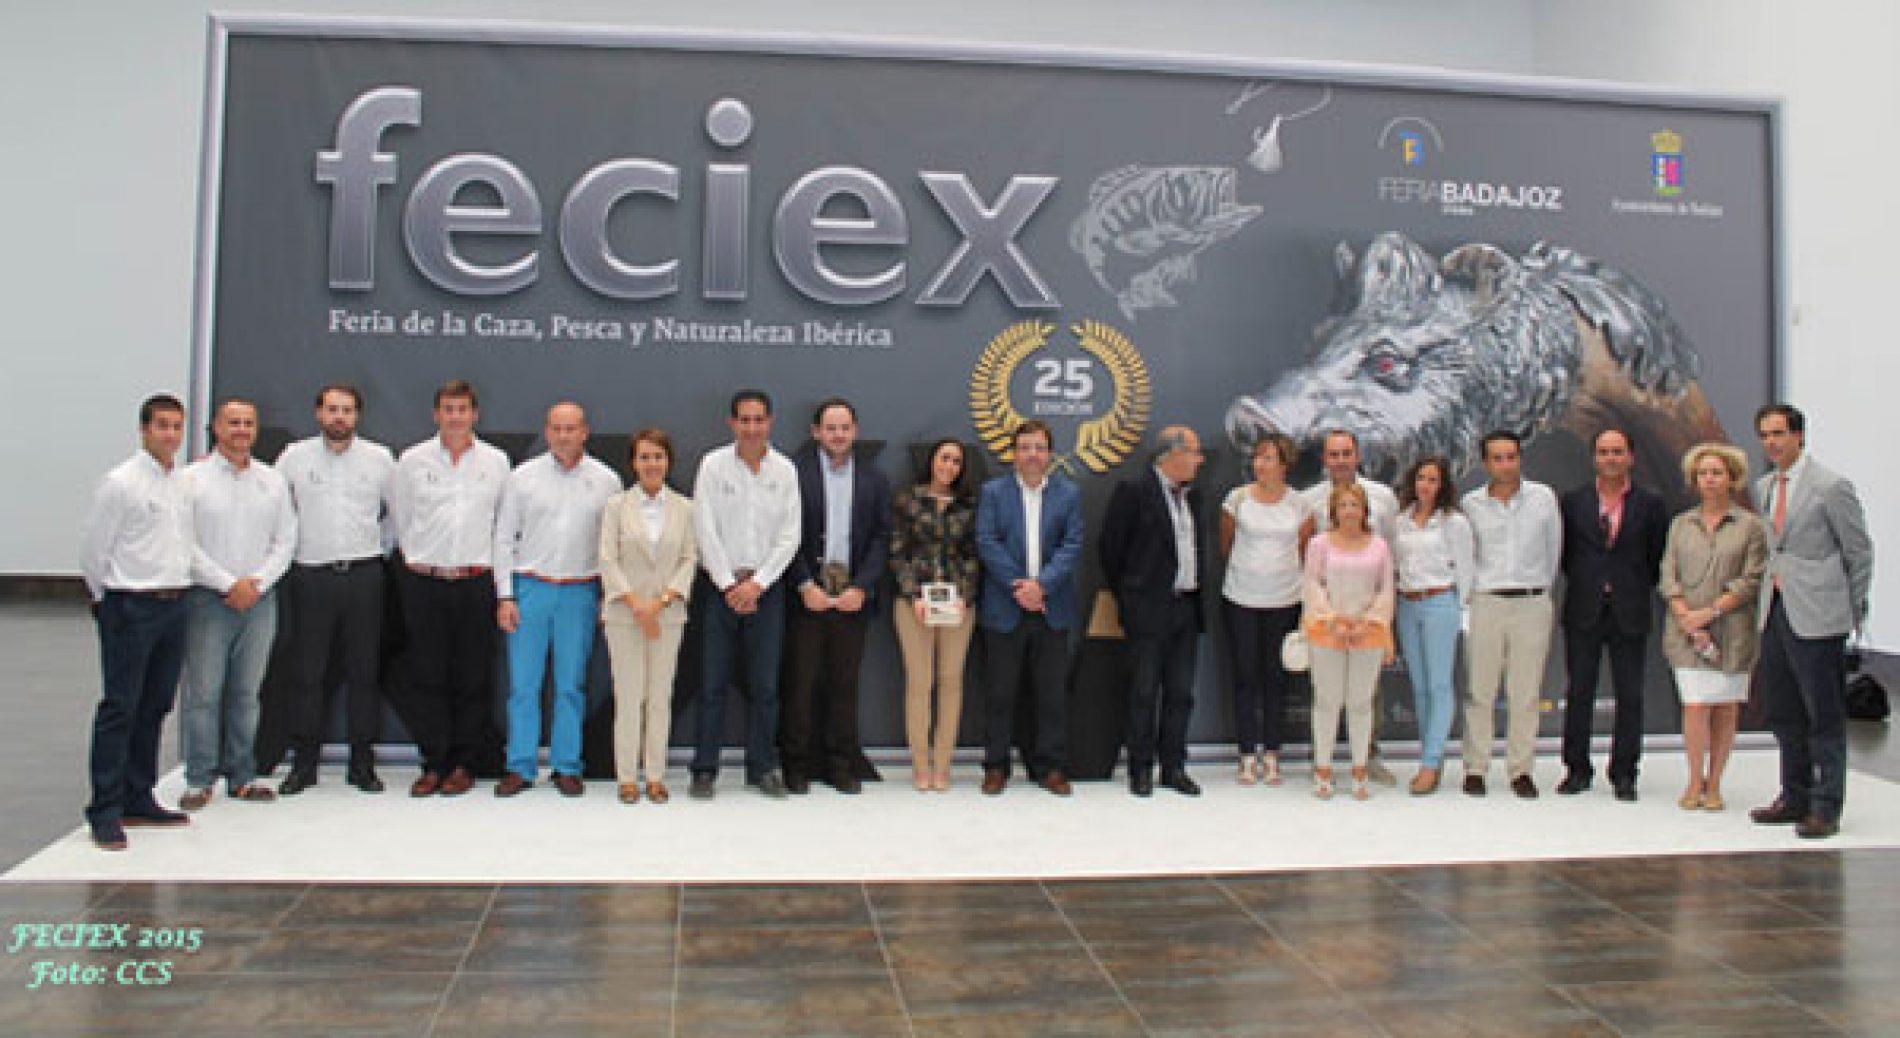 Raúl Sánchez de Castro, Premio JUVENEX-FECIEX 2015